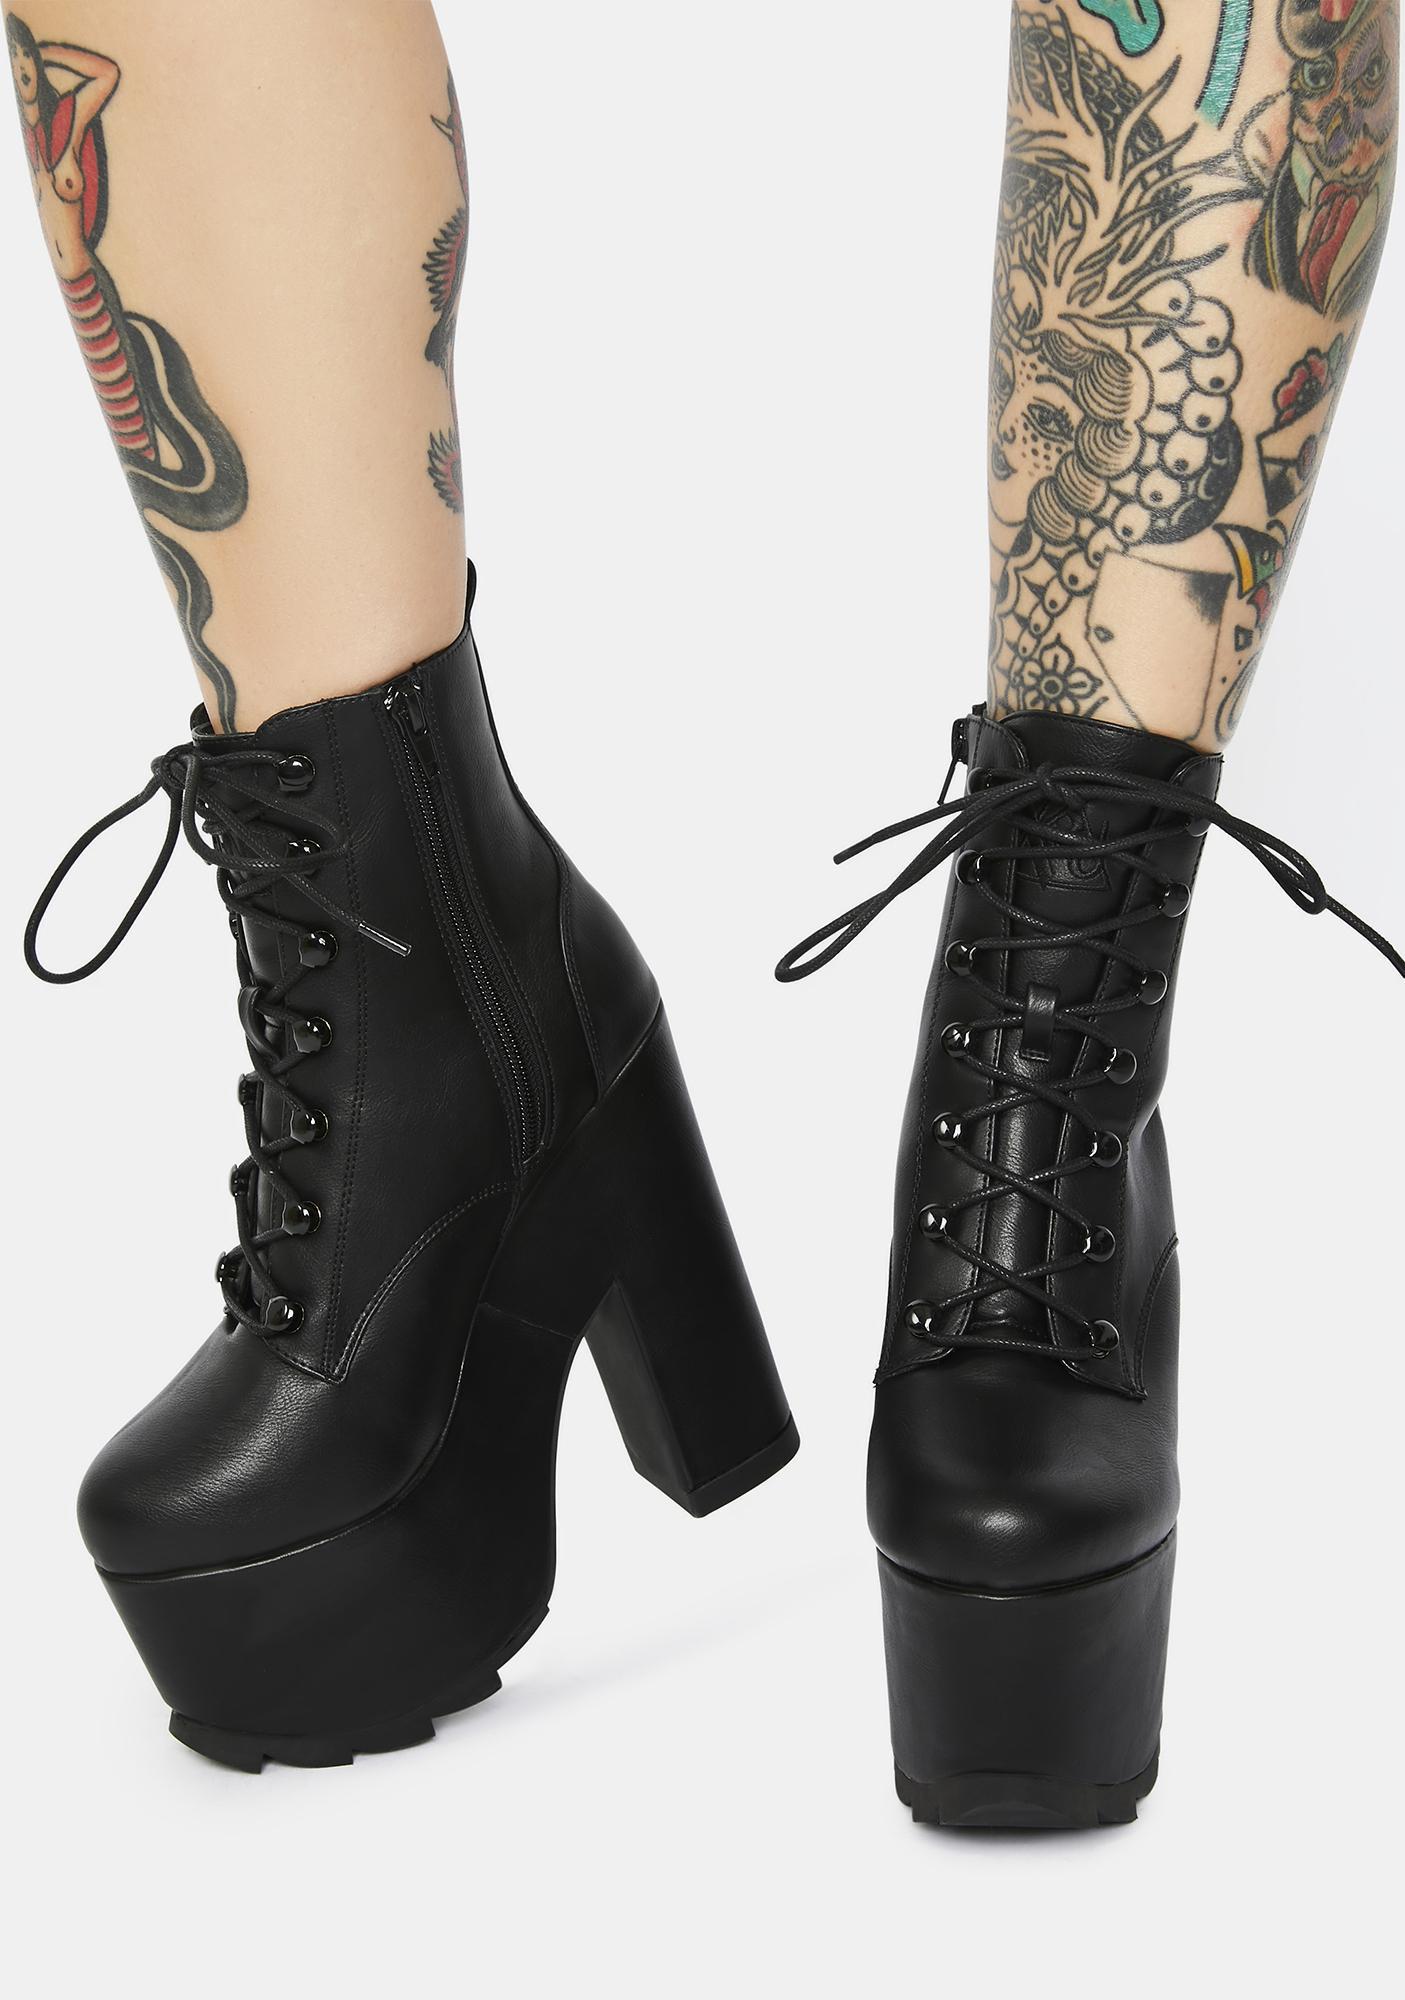 Y.R.U. Black Night Terror Platform Boots